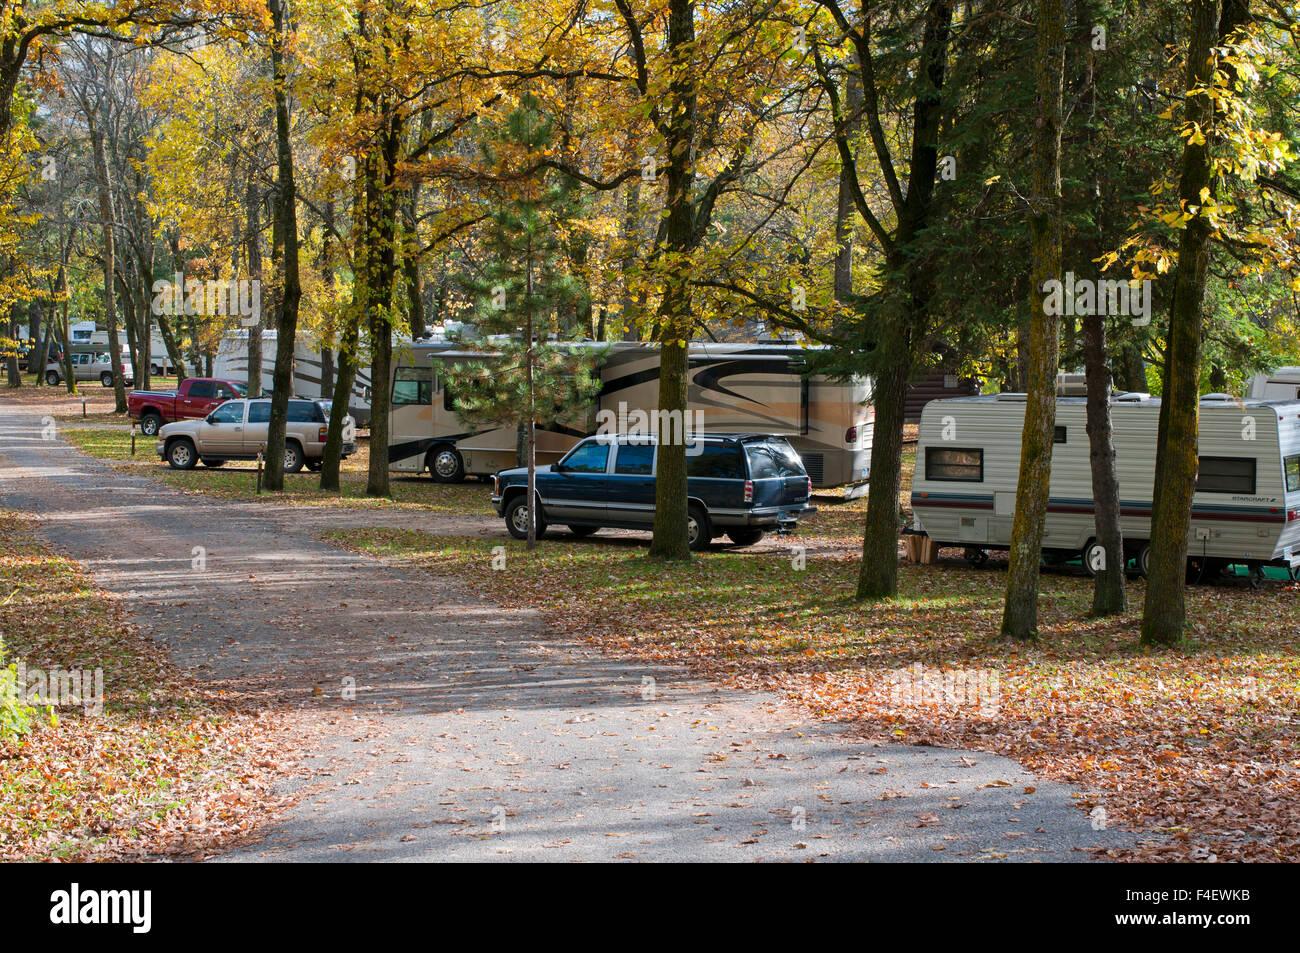 USA, Minnesota, Itasca State Park, Bear Paw Campground Stock